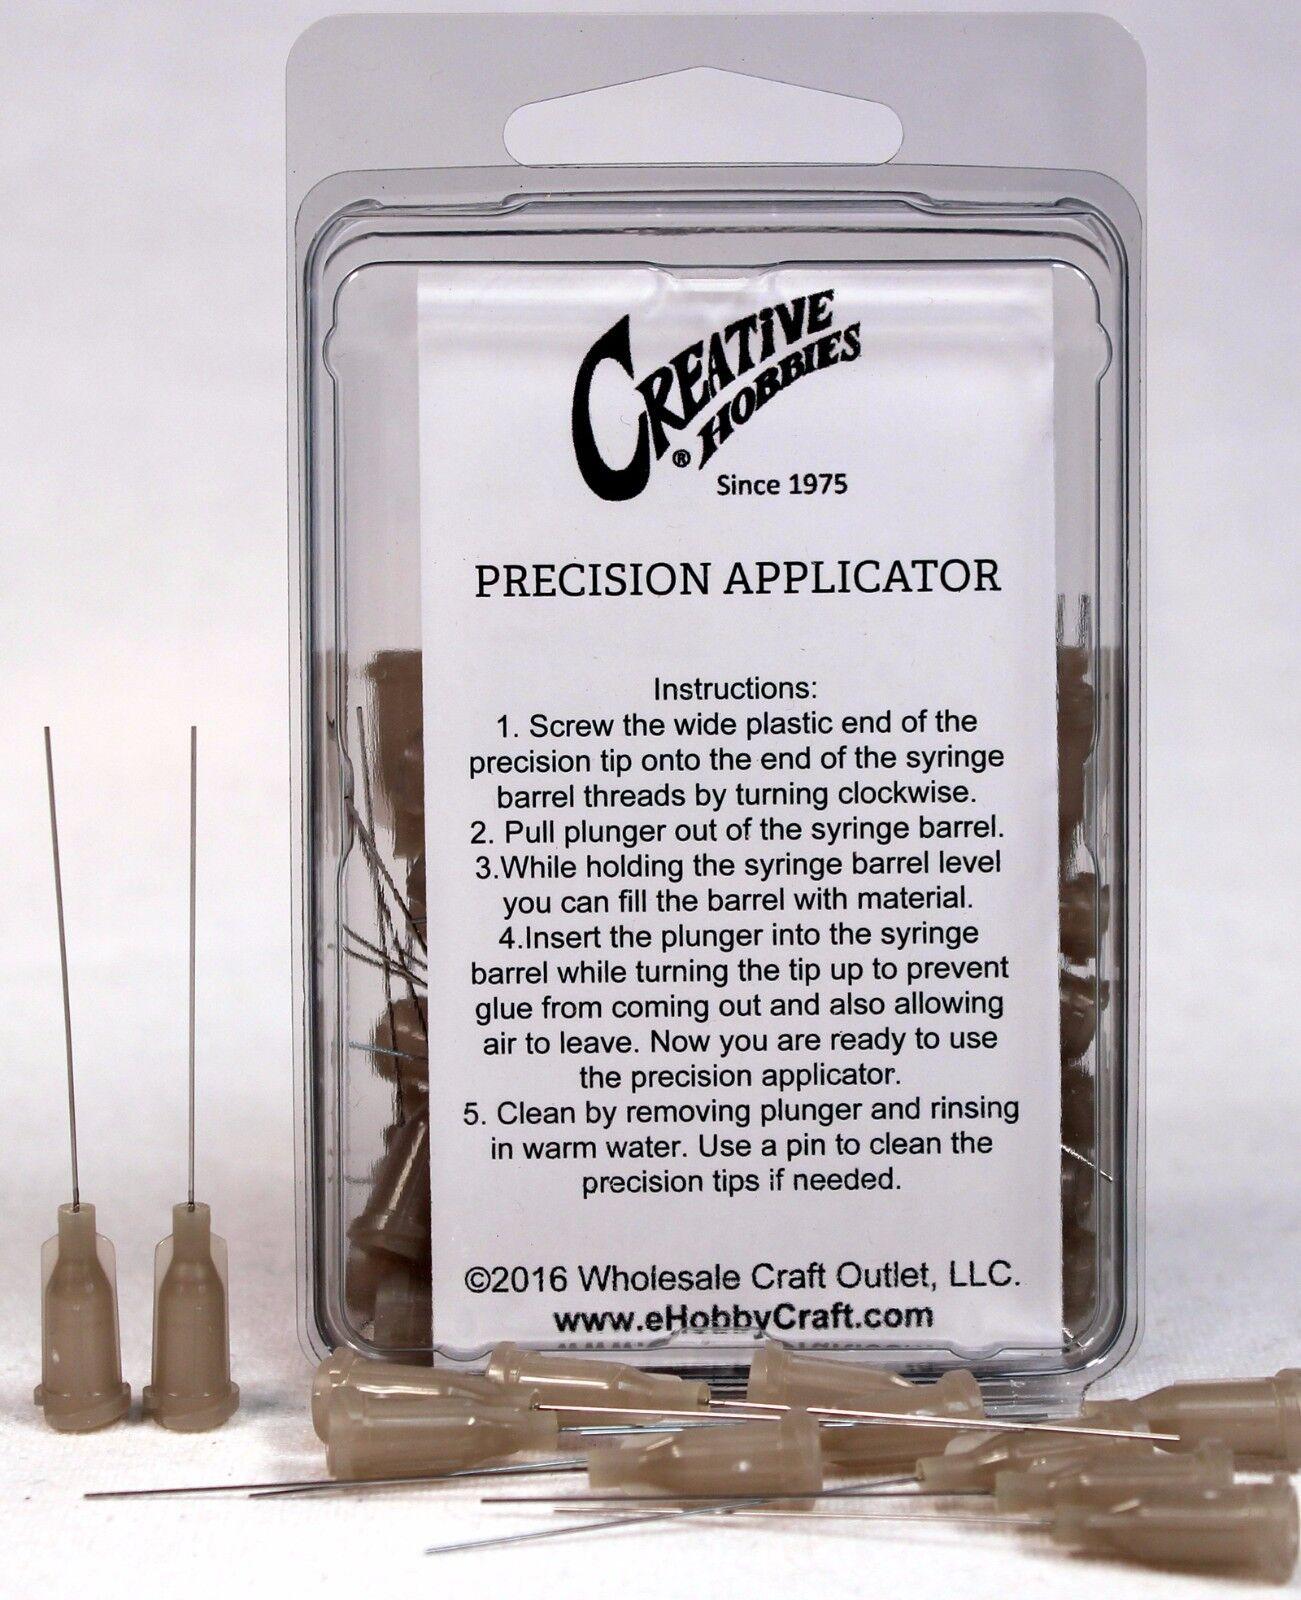 27 Gauge 1.5 Inch, Precision Applicator Dispensing Needle Tips, 50 Pieces Adhesive Guns & Dispensers